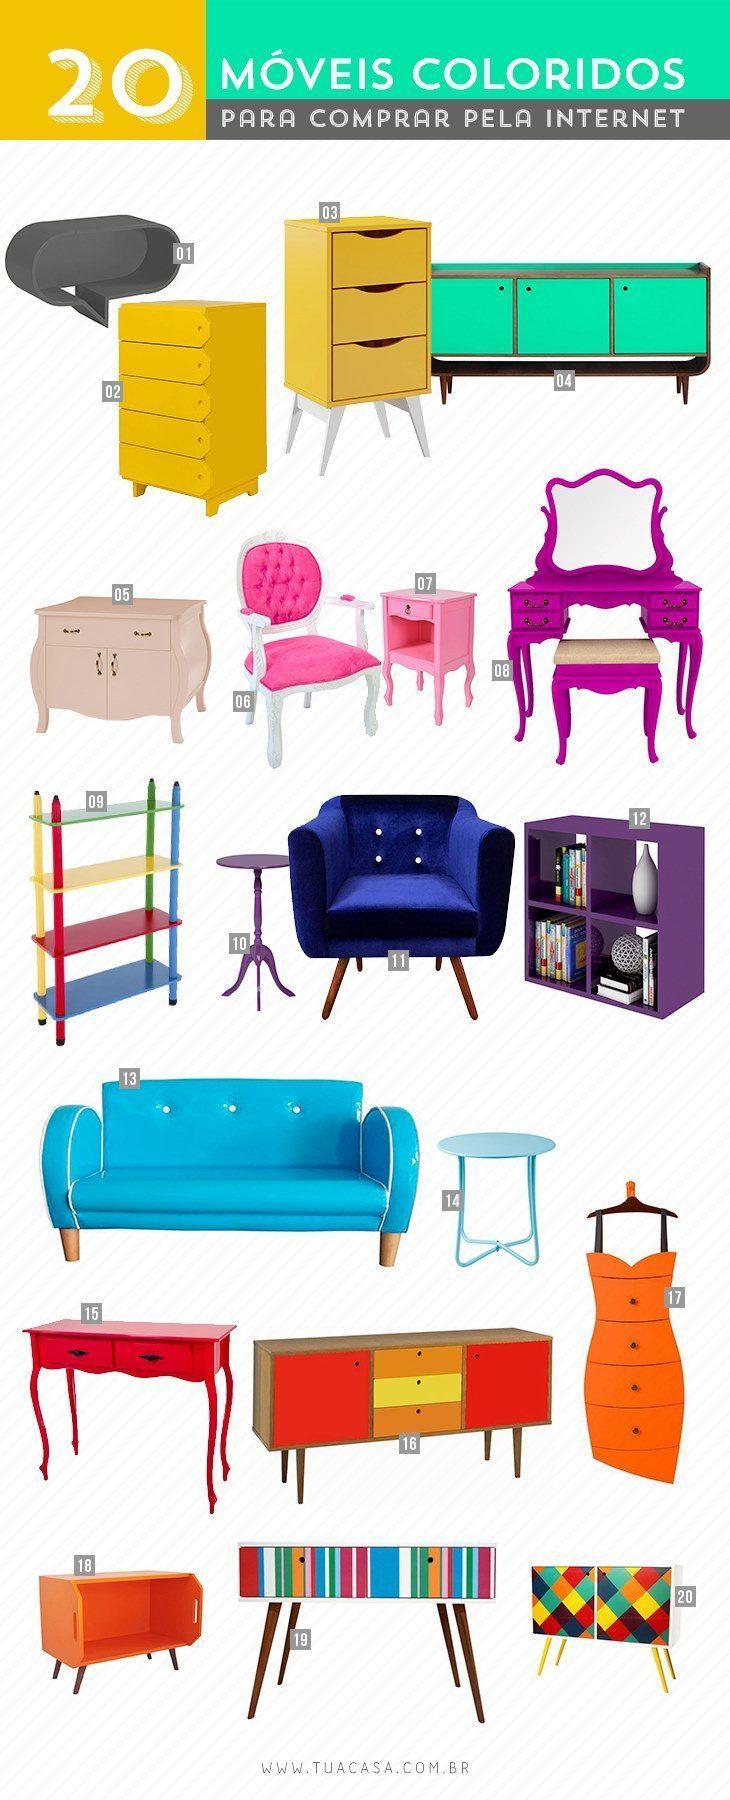 aa2895691ece Móveis coloridos: 150 ideias para decorar diversos ambientes da casa